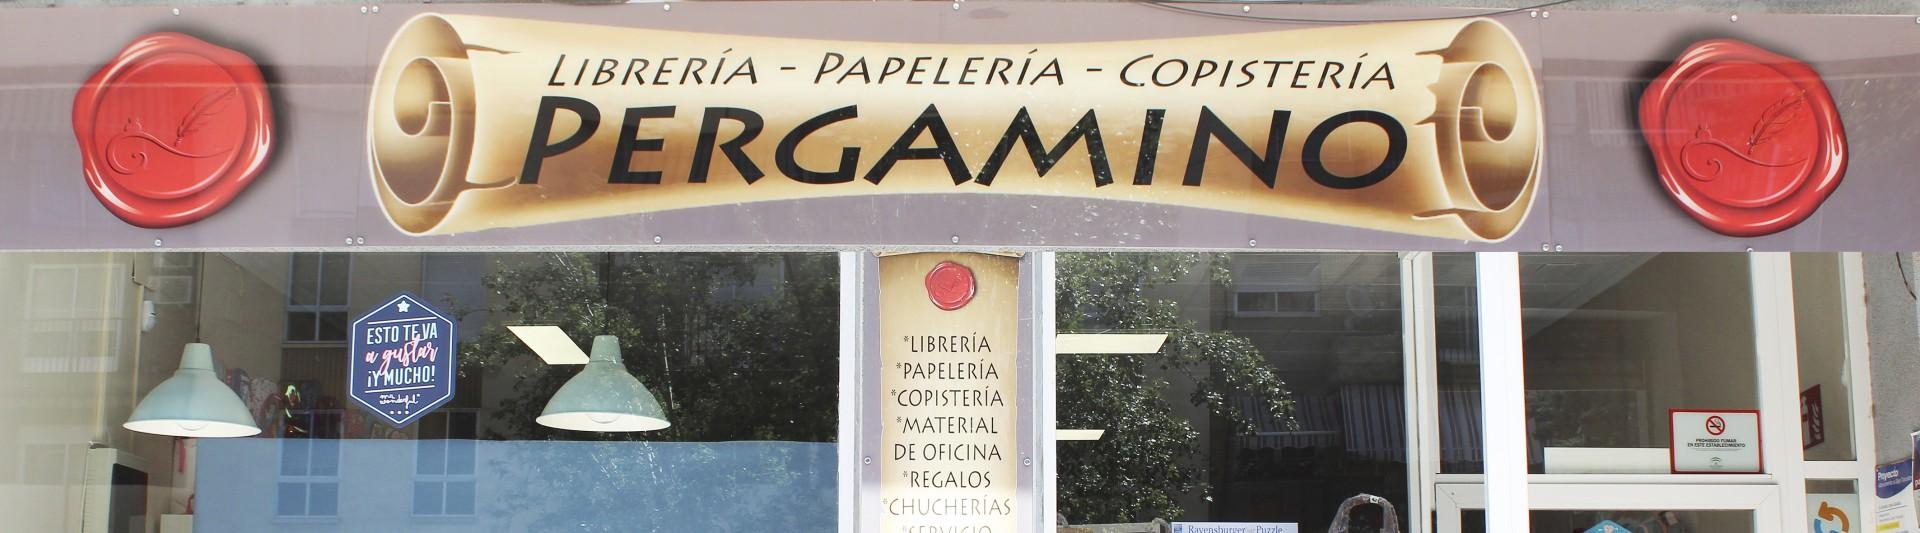 PAPELERÍA LIBRERÍA PERGAMINO